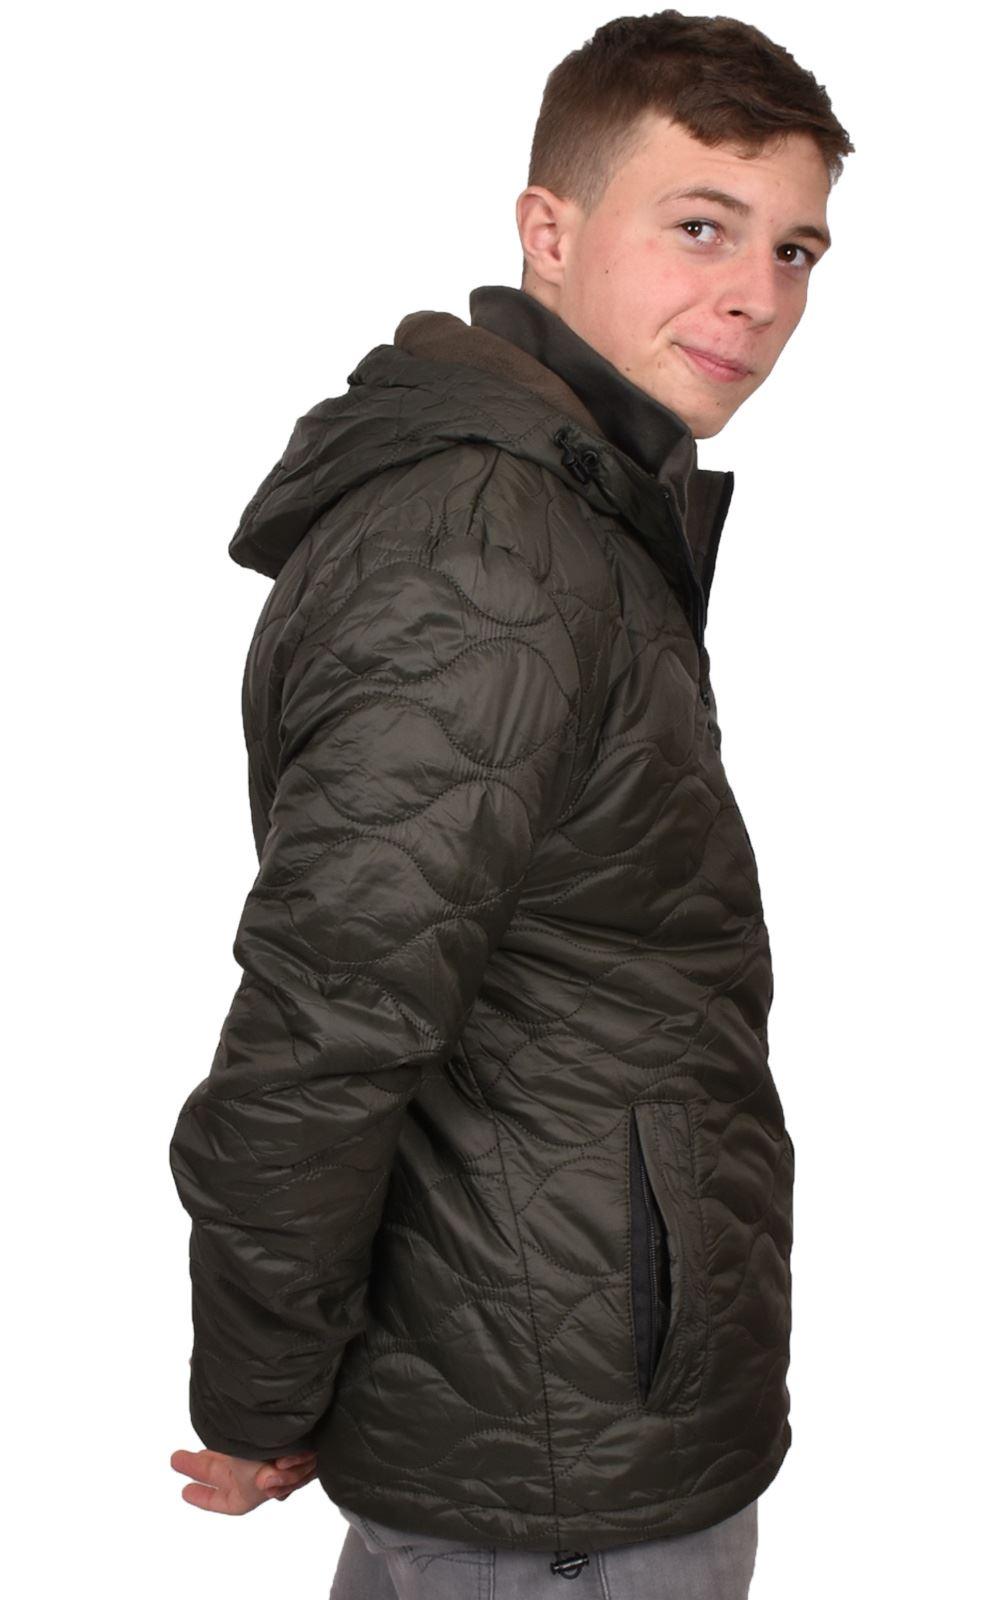 Mens-Smith-amp-Jones-Jacket-Full-Zip-Fleece-Lined-Hooded-Light-Weight-Warm-Coat thumbnail 15